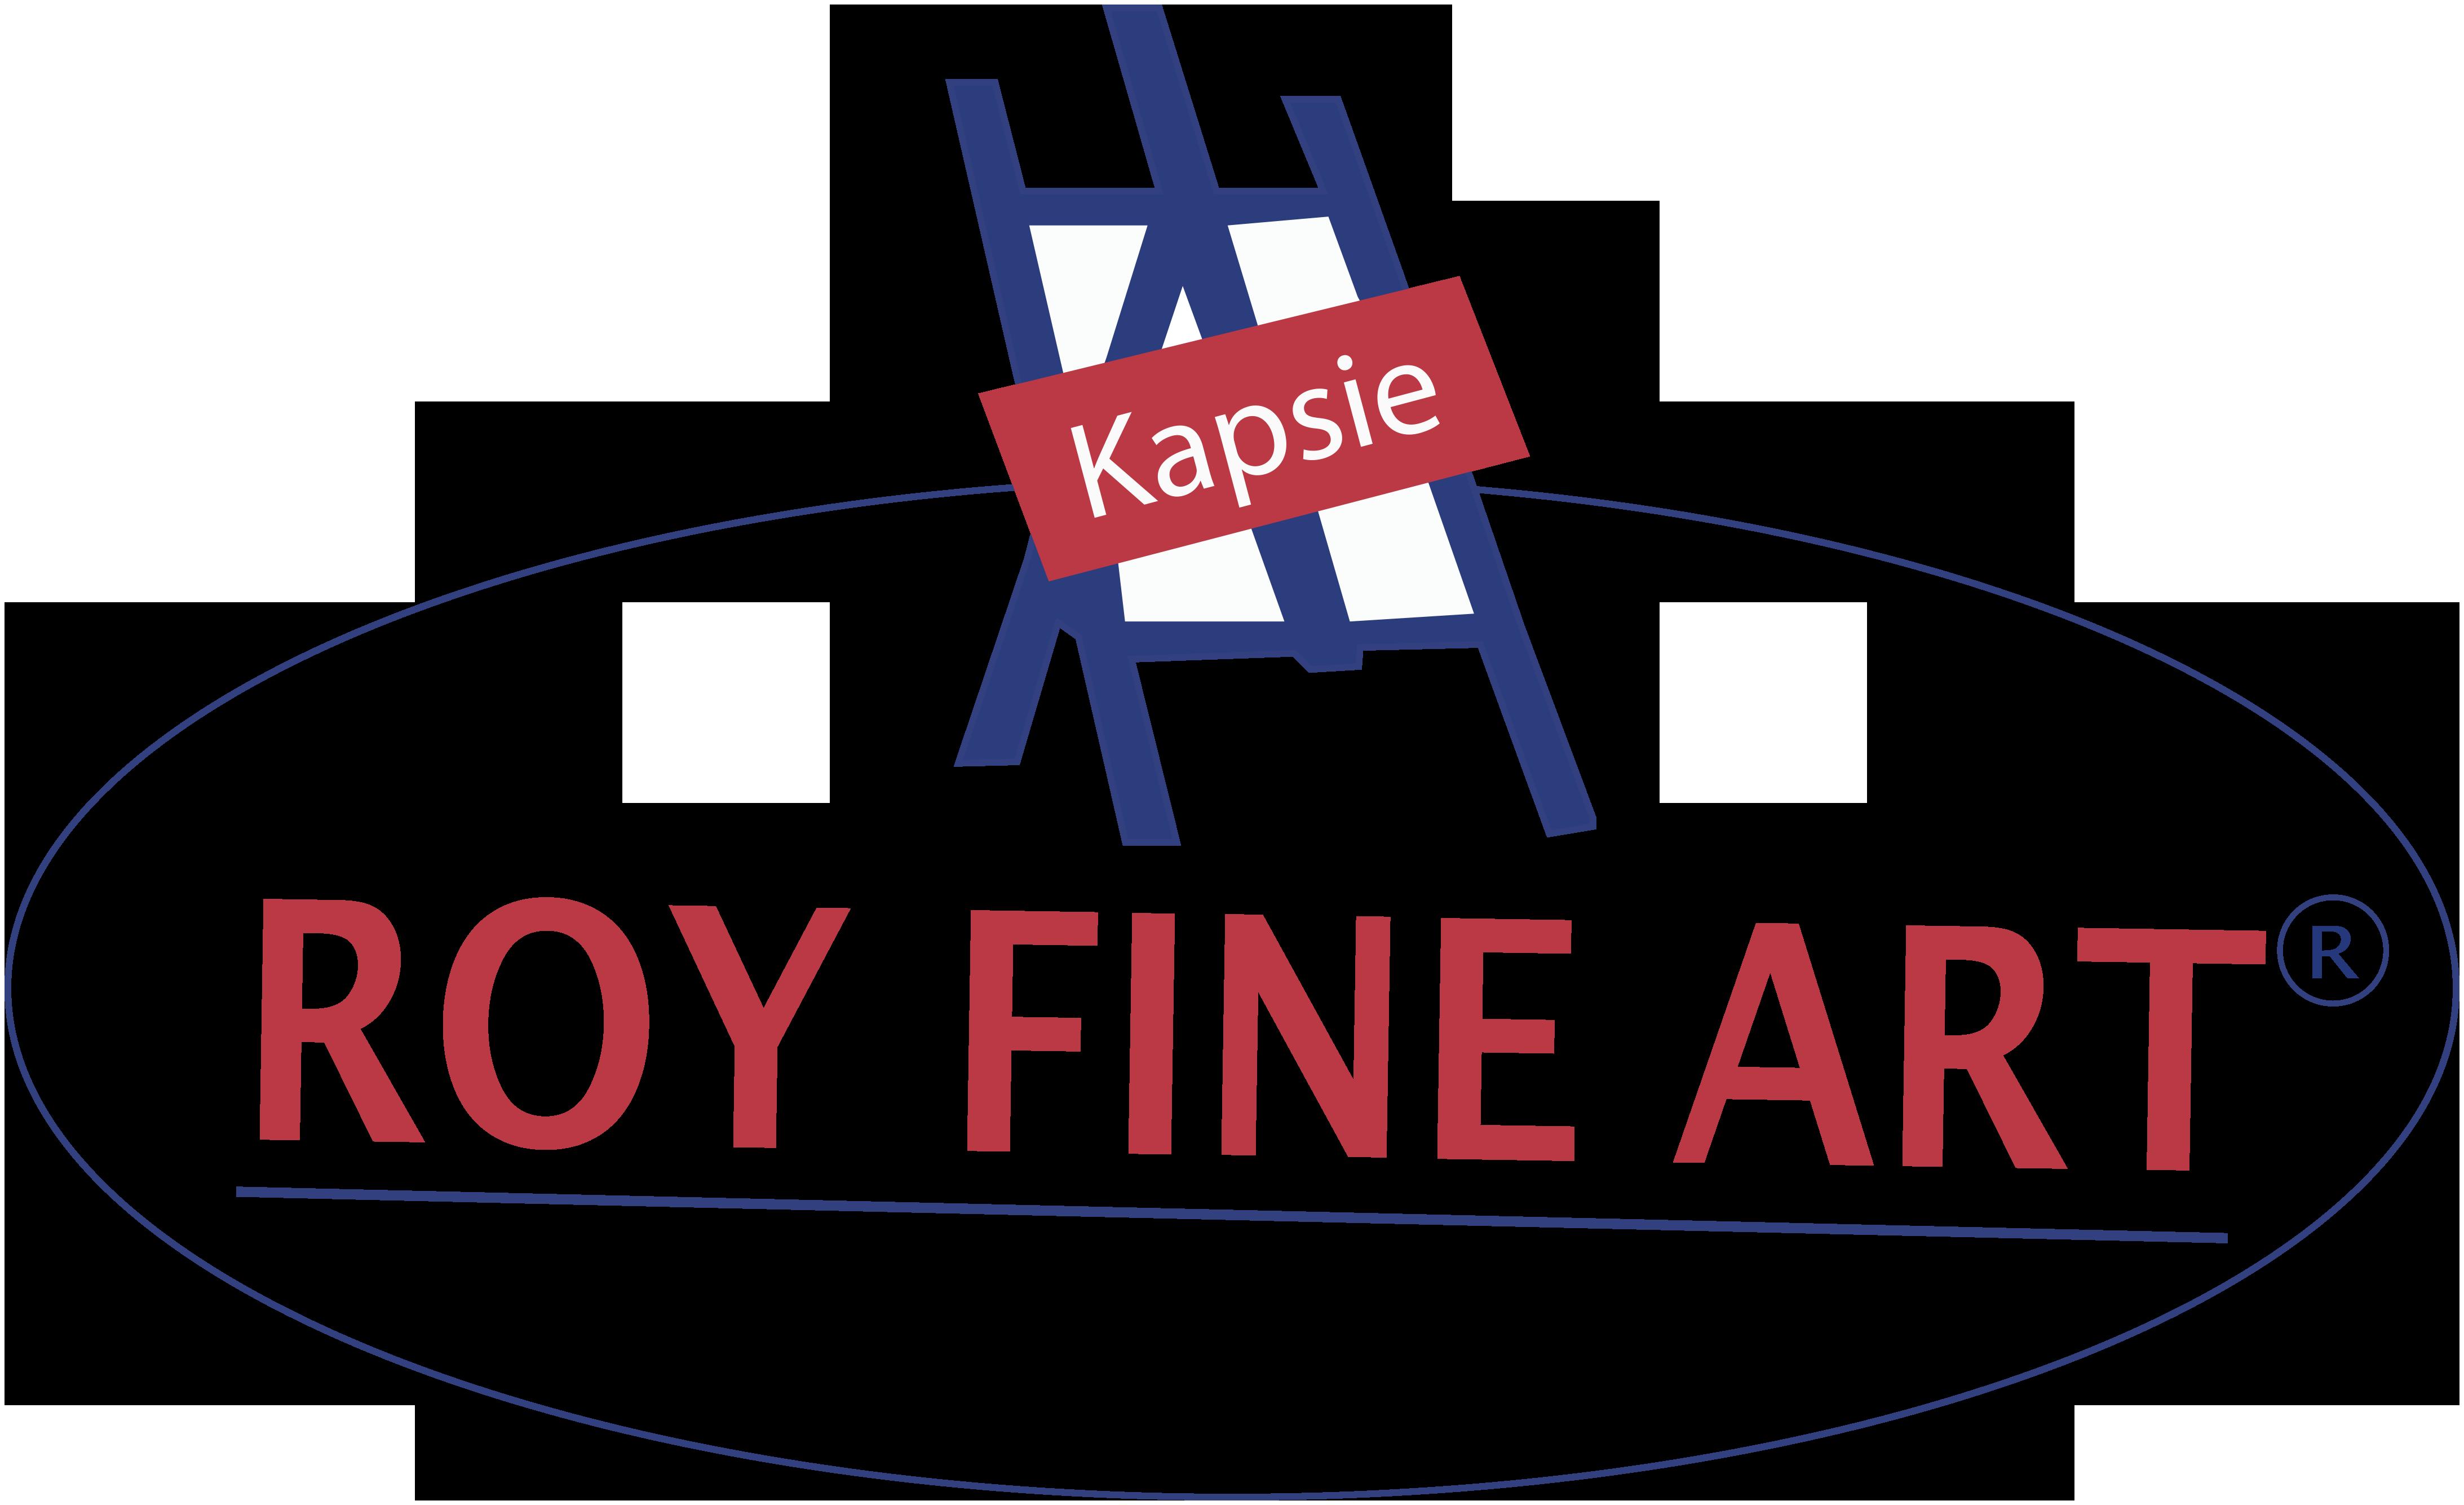 Roy Fine Art - Top Manufacturer of Artist Canvas!